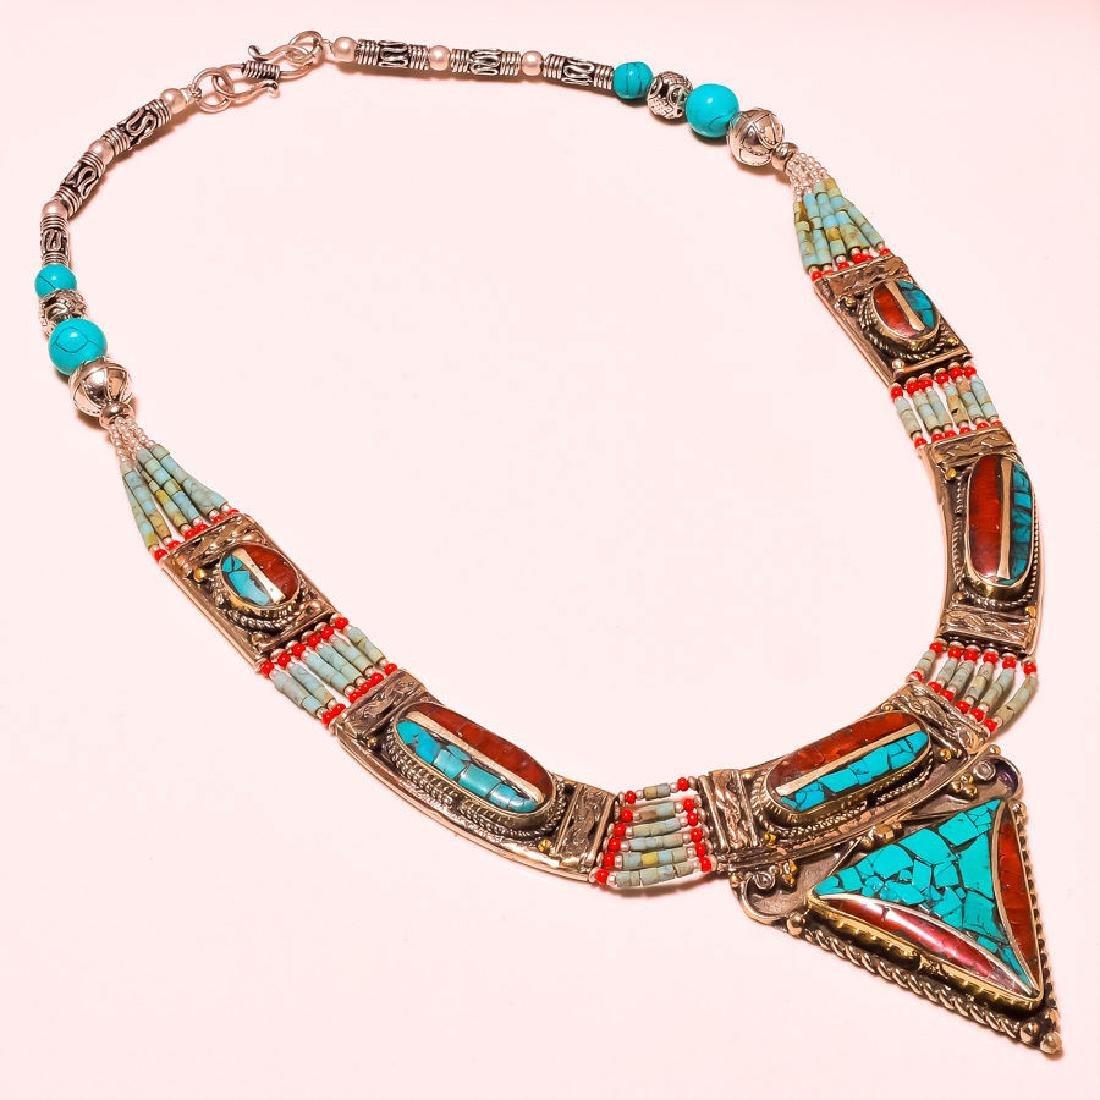 Tibetan Lapis Lazuli & Turquoise & Red Coral Necklace